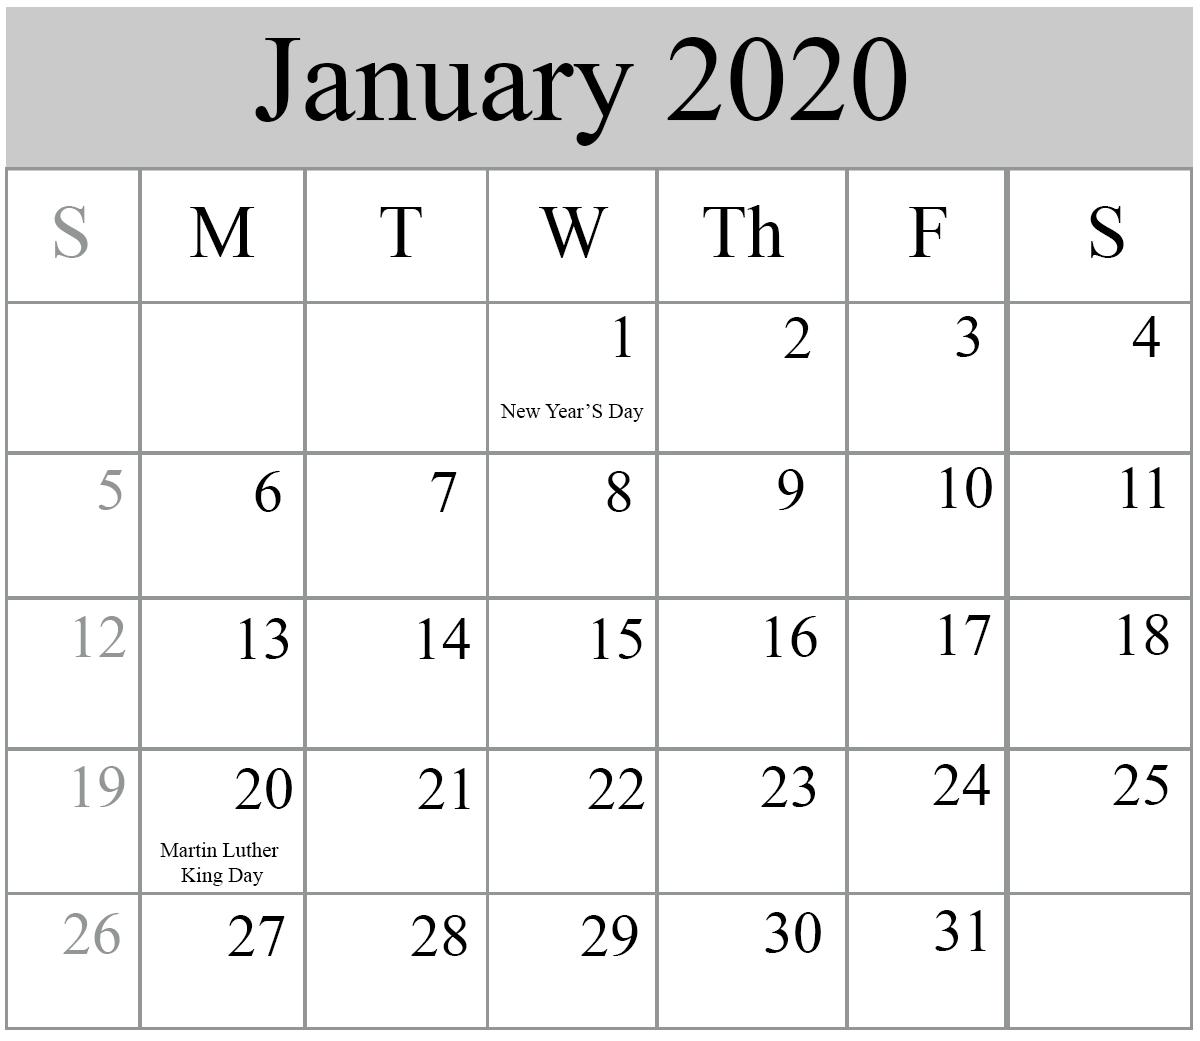 Free January 2020 Printable Calendar With Holidays throughout 2020 Calendar Free Printable Imom